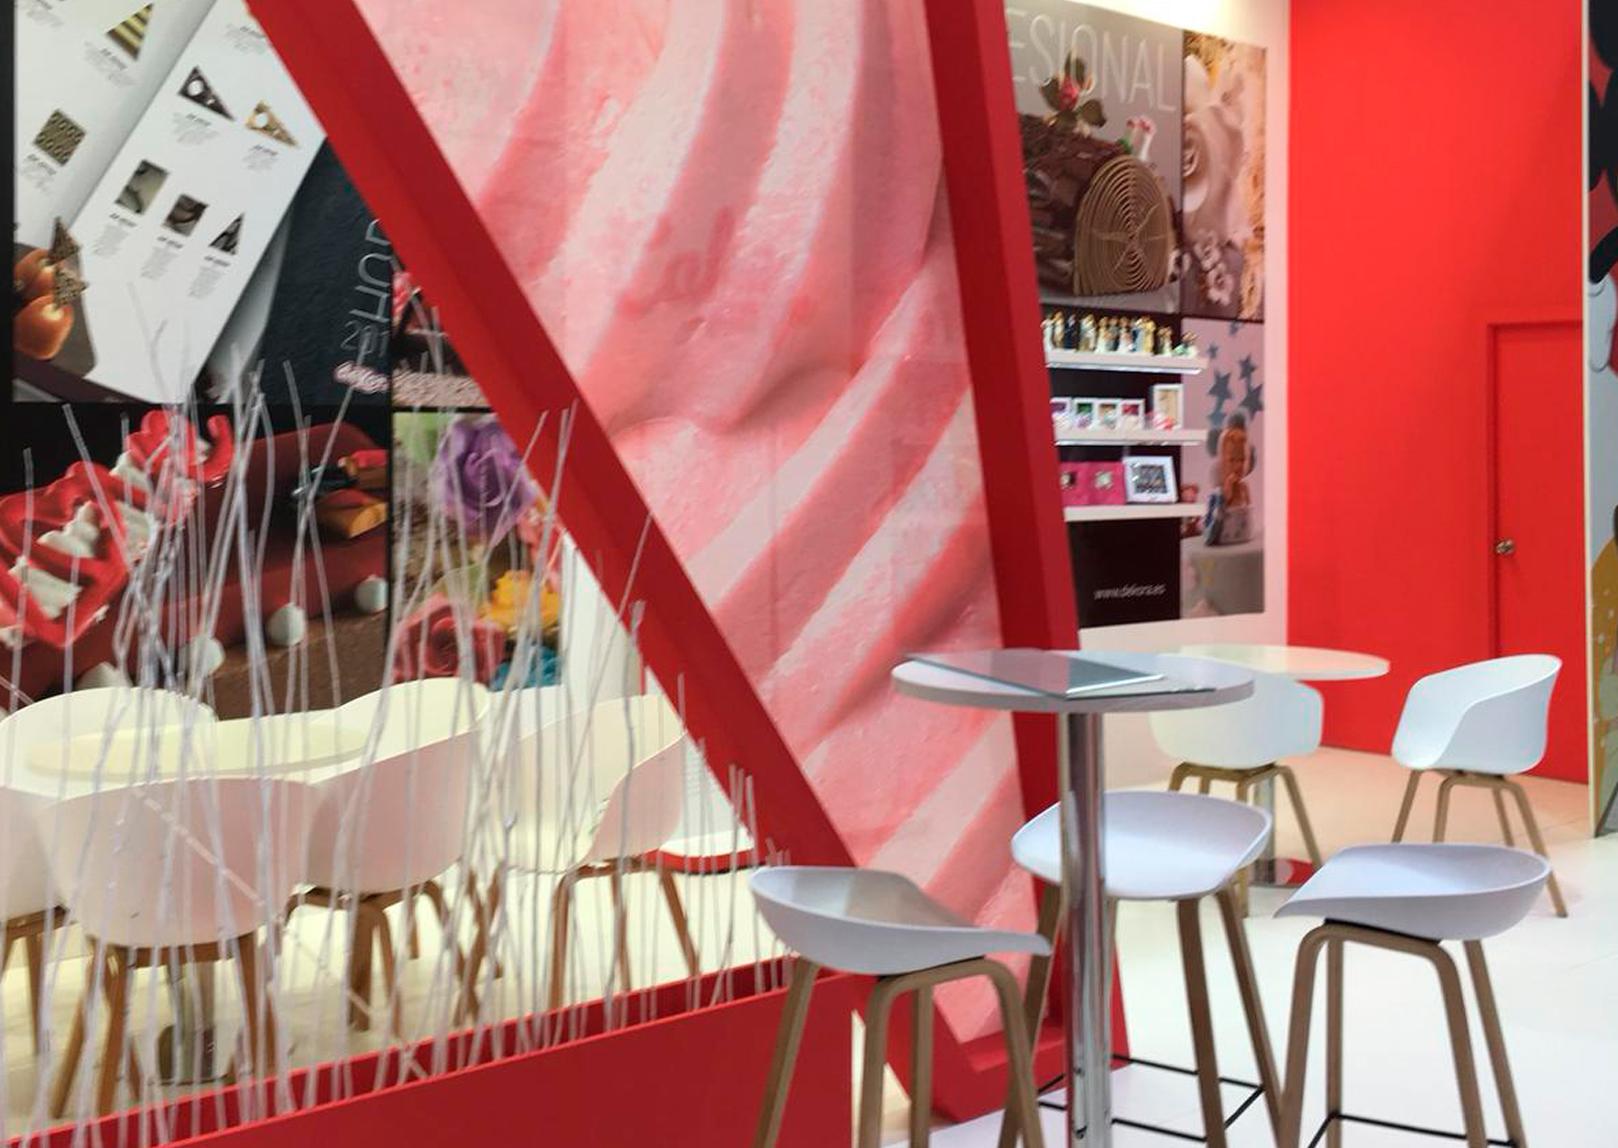 stand-dekora-feria-intersicop-madrid-2019-01